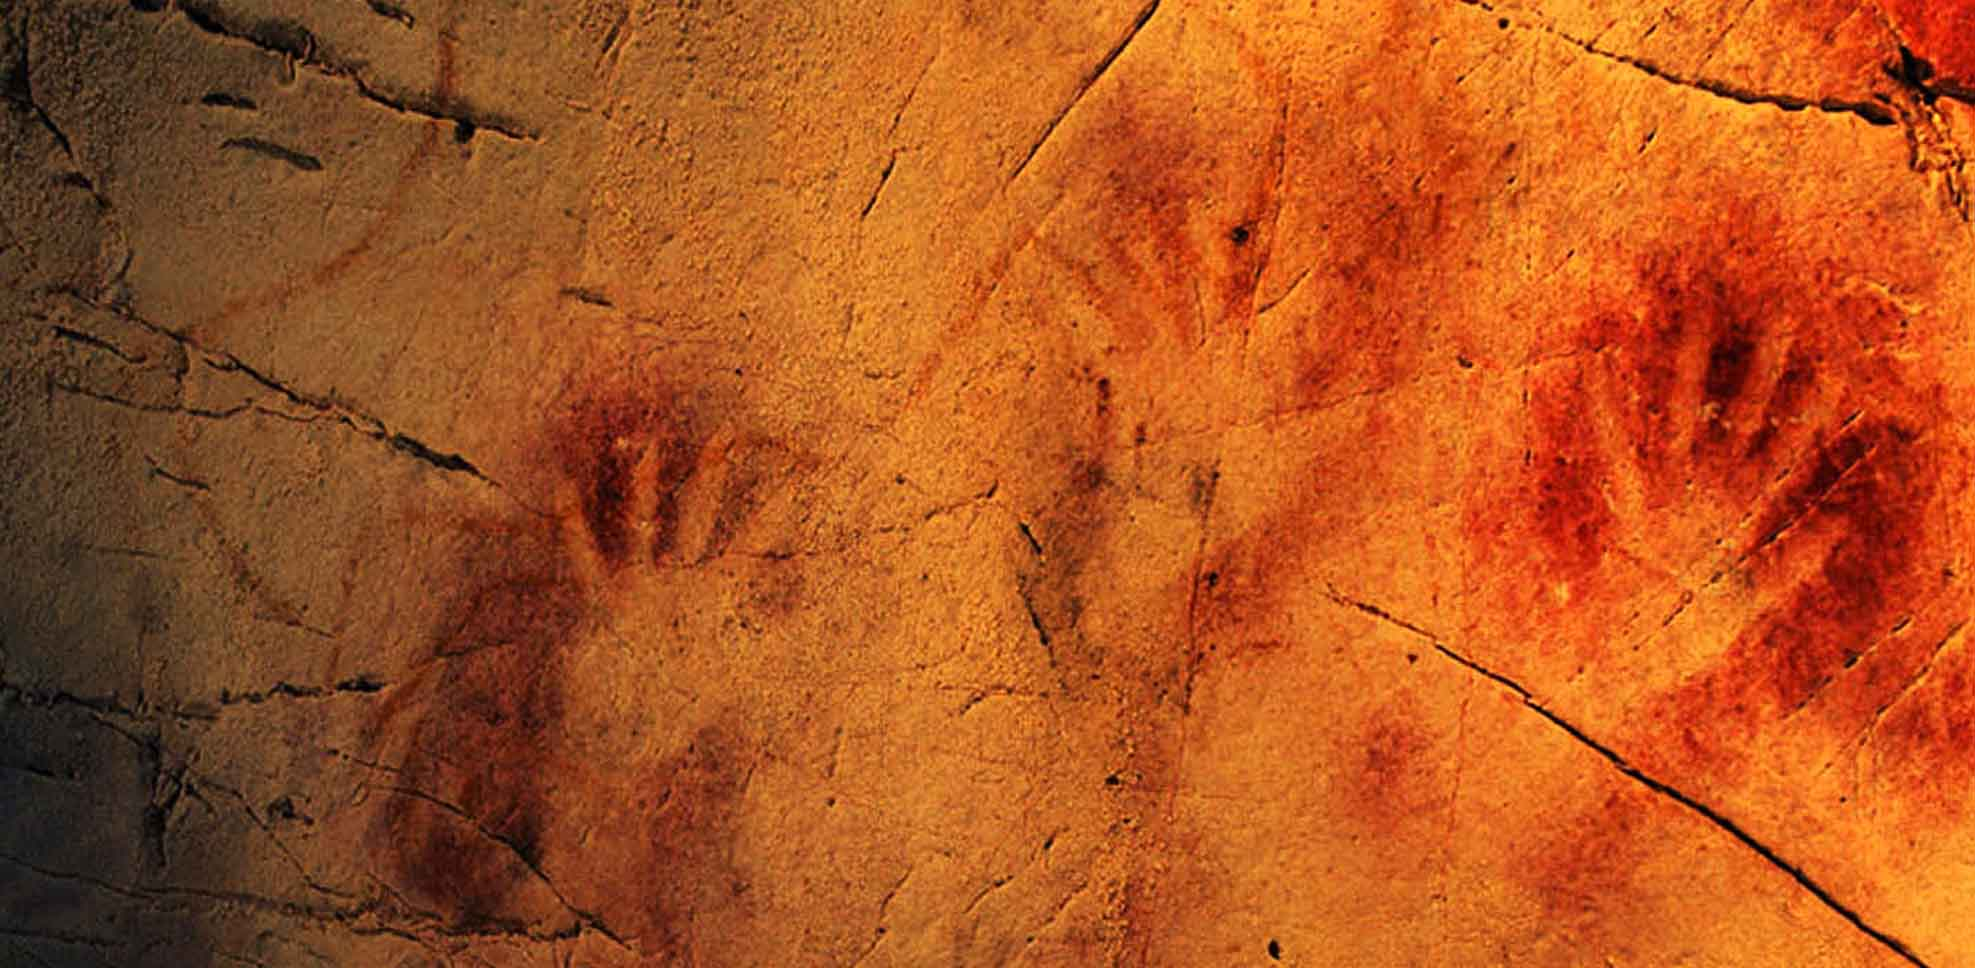 Encuesta Manos rupestres paleolíticas